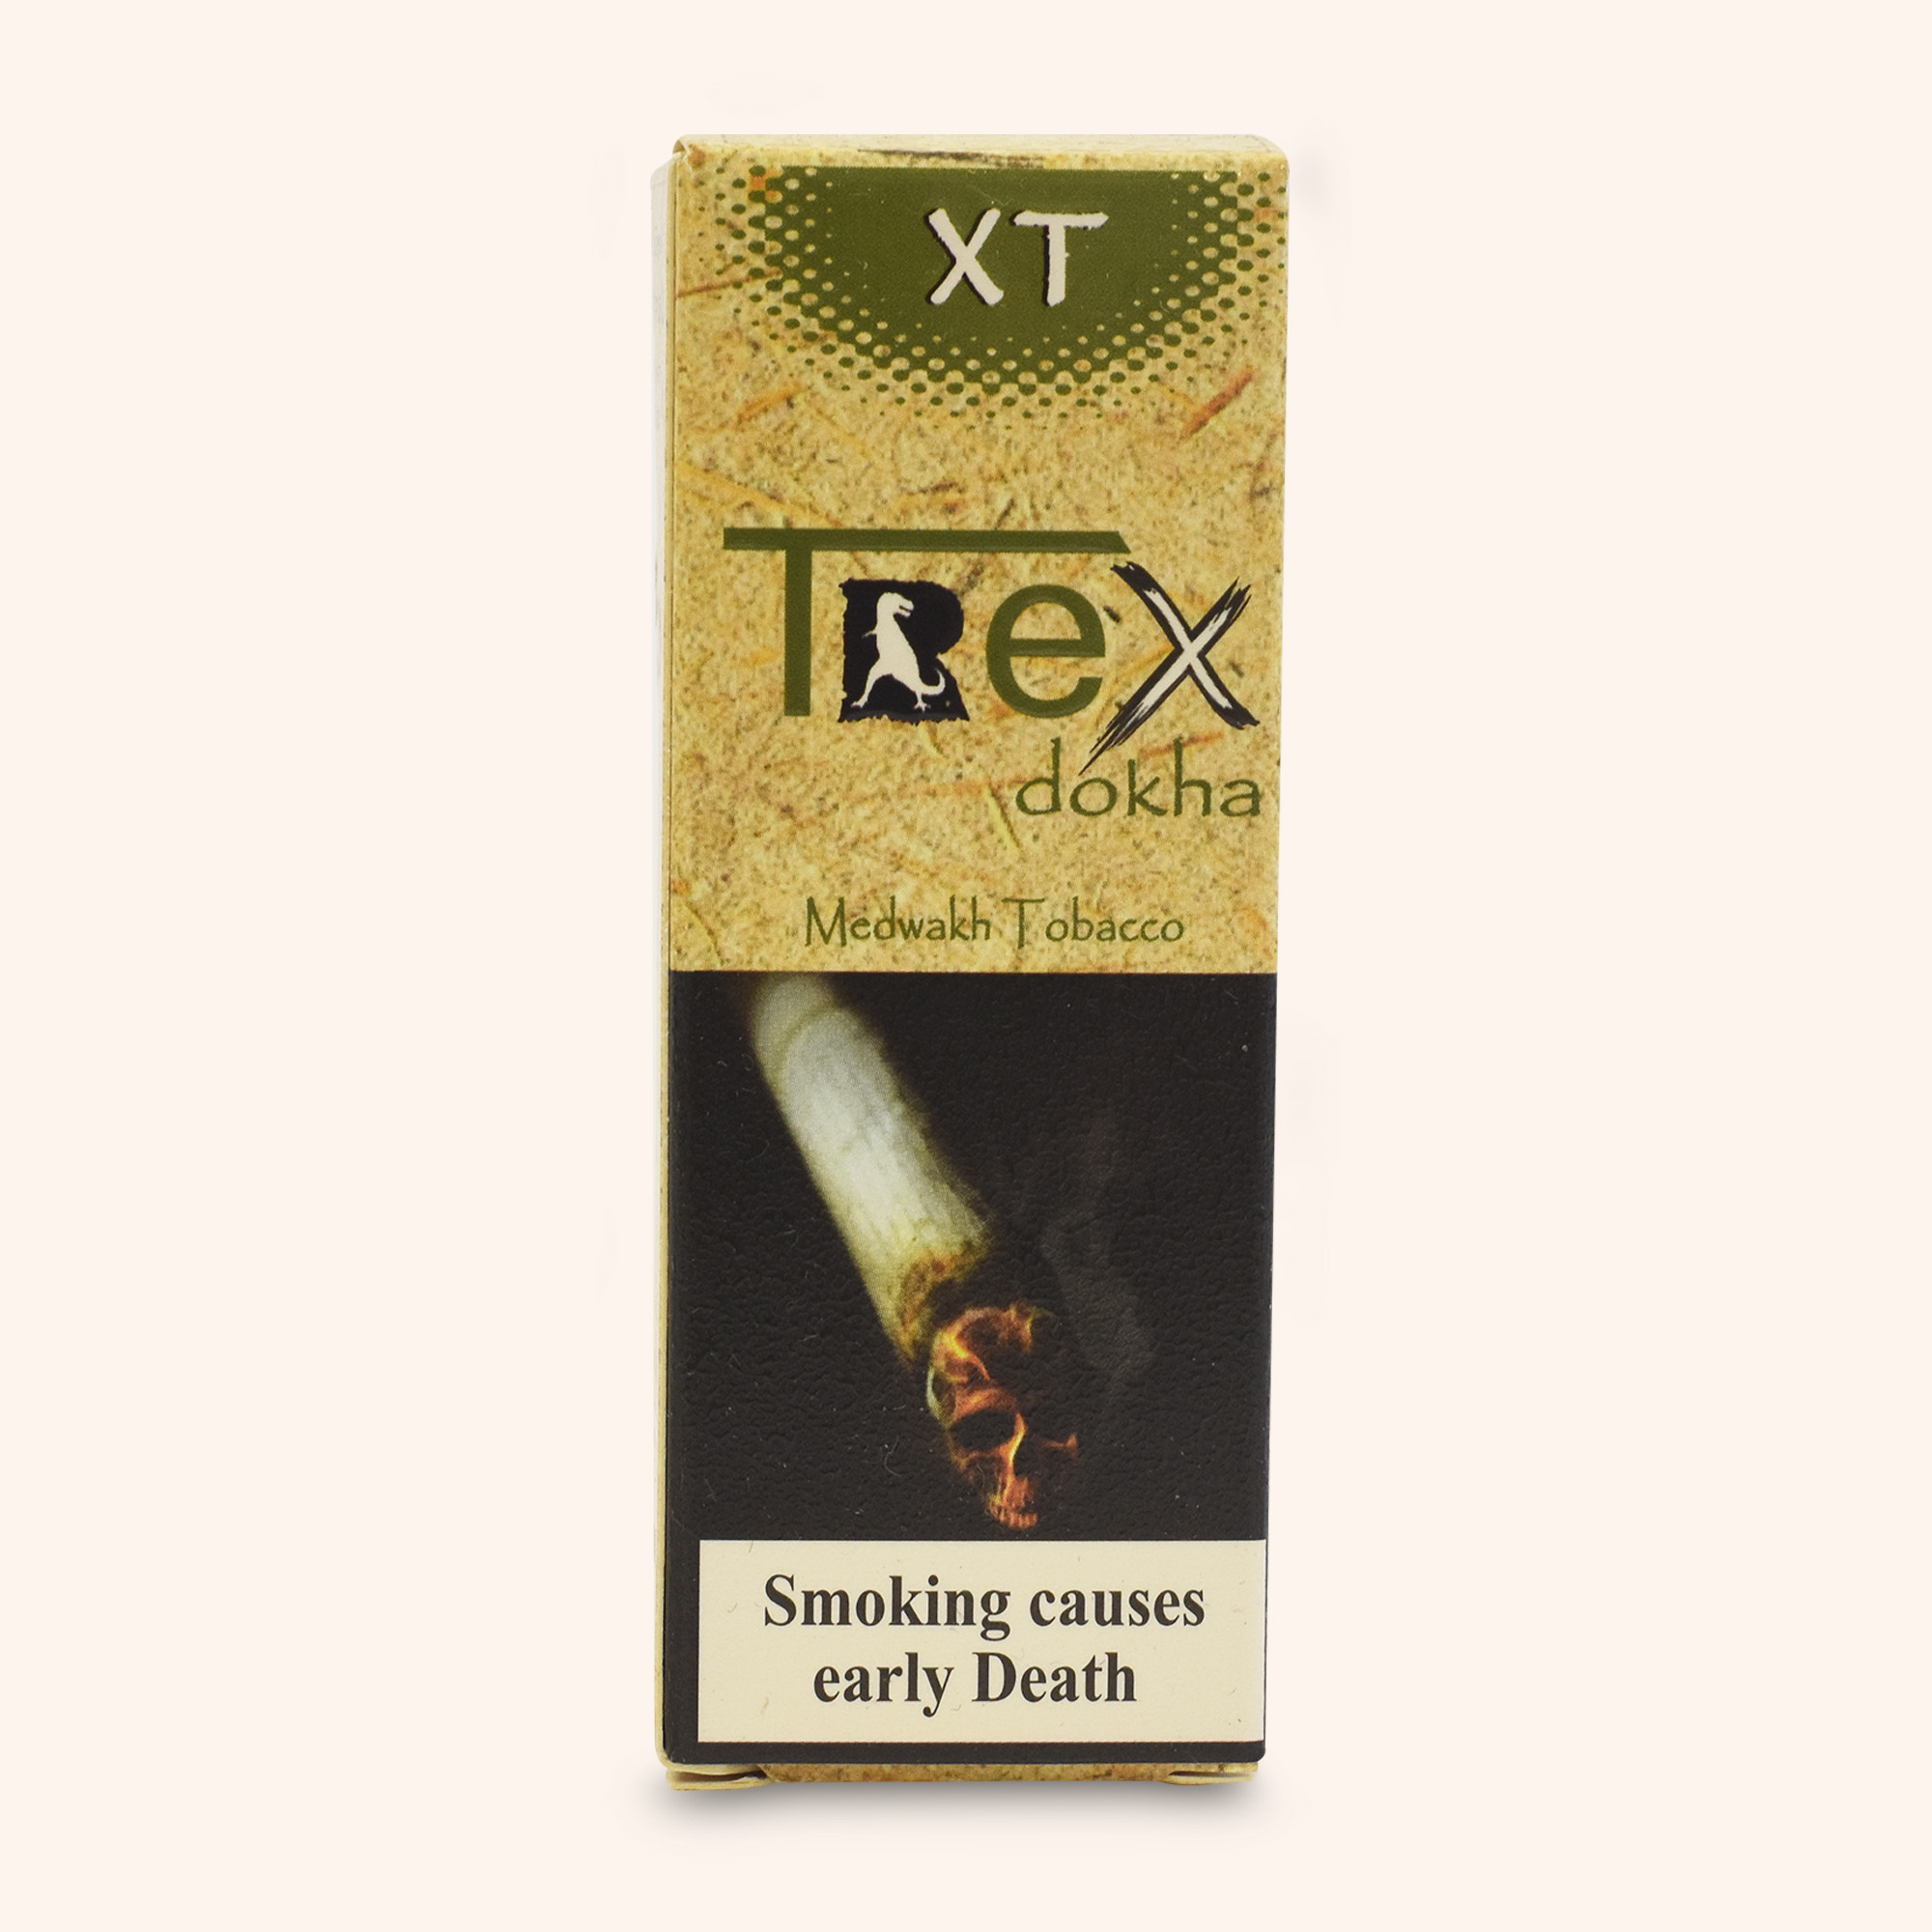 Trex XT Dokha by Bin Khumery – 50ml / 14g